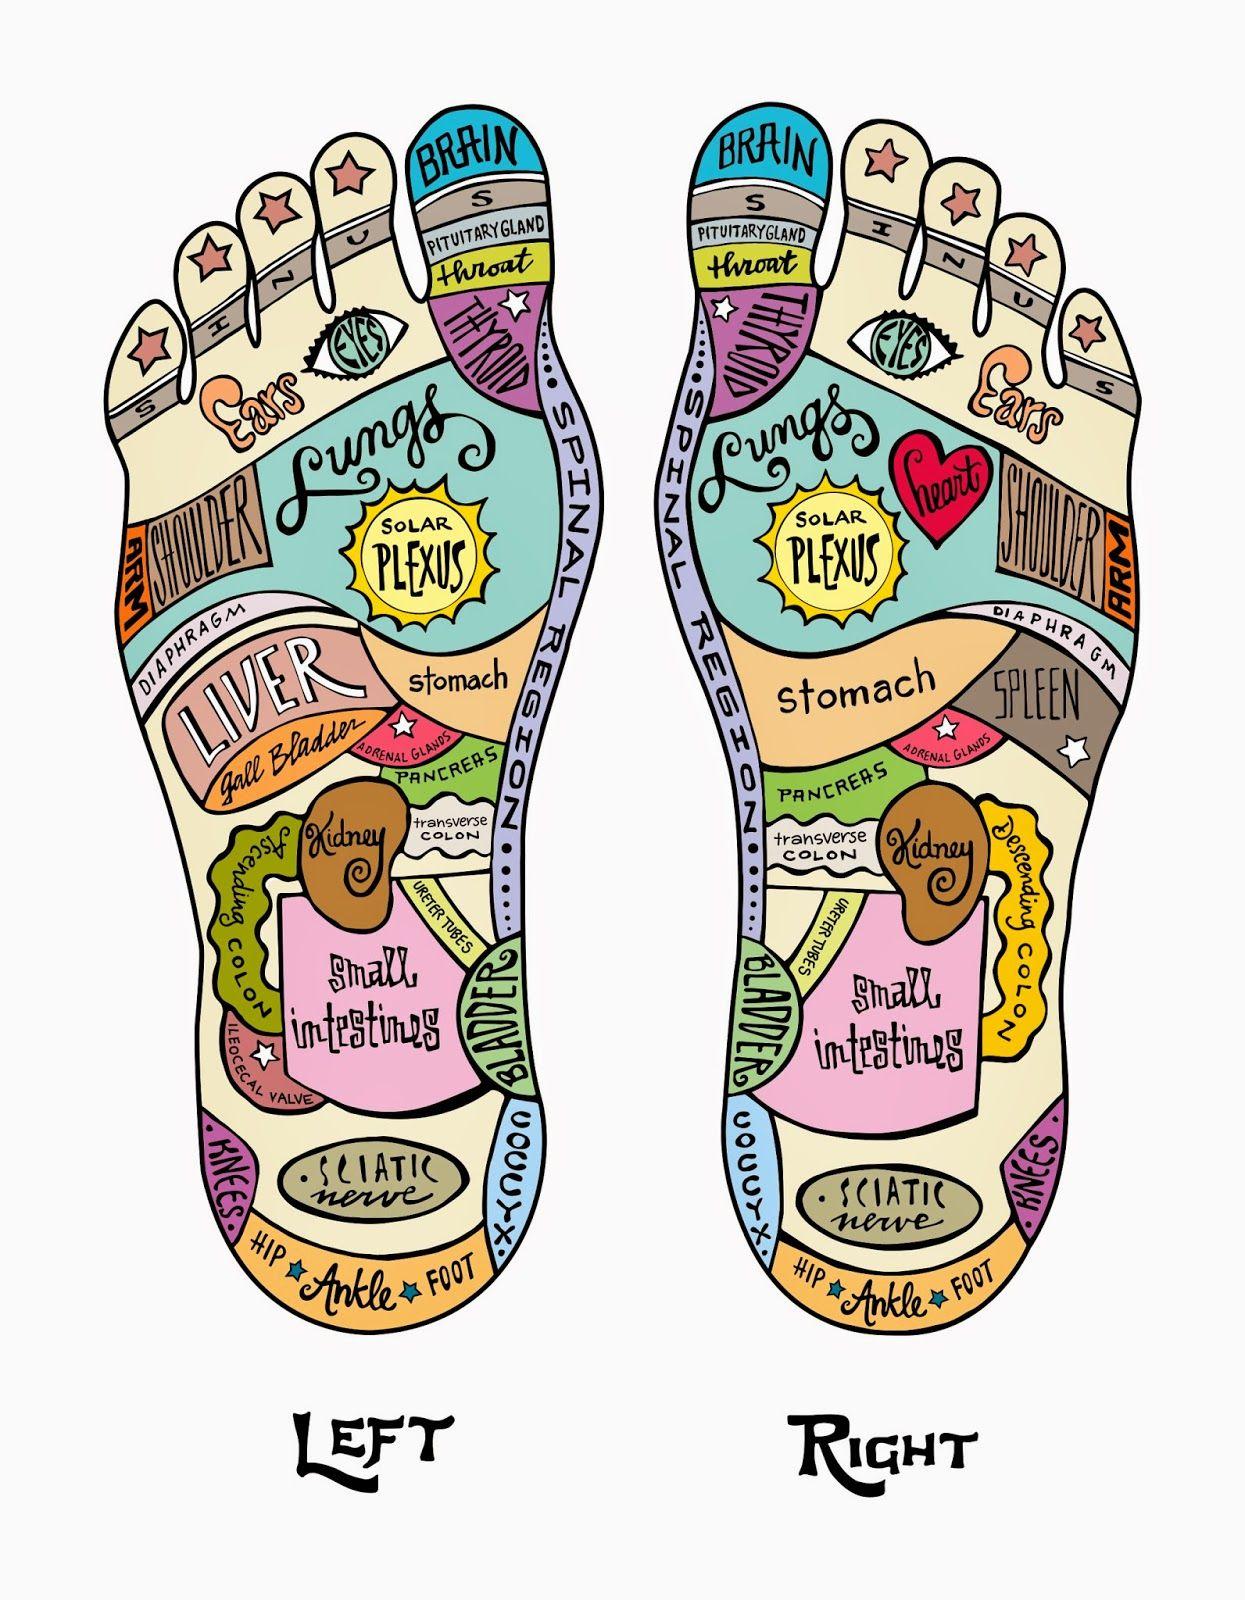 Reflexology socks fun  Google Search  accupress  Pinterest